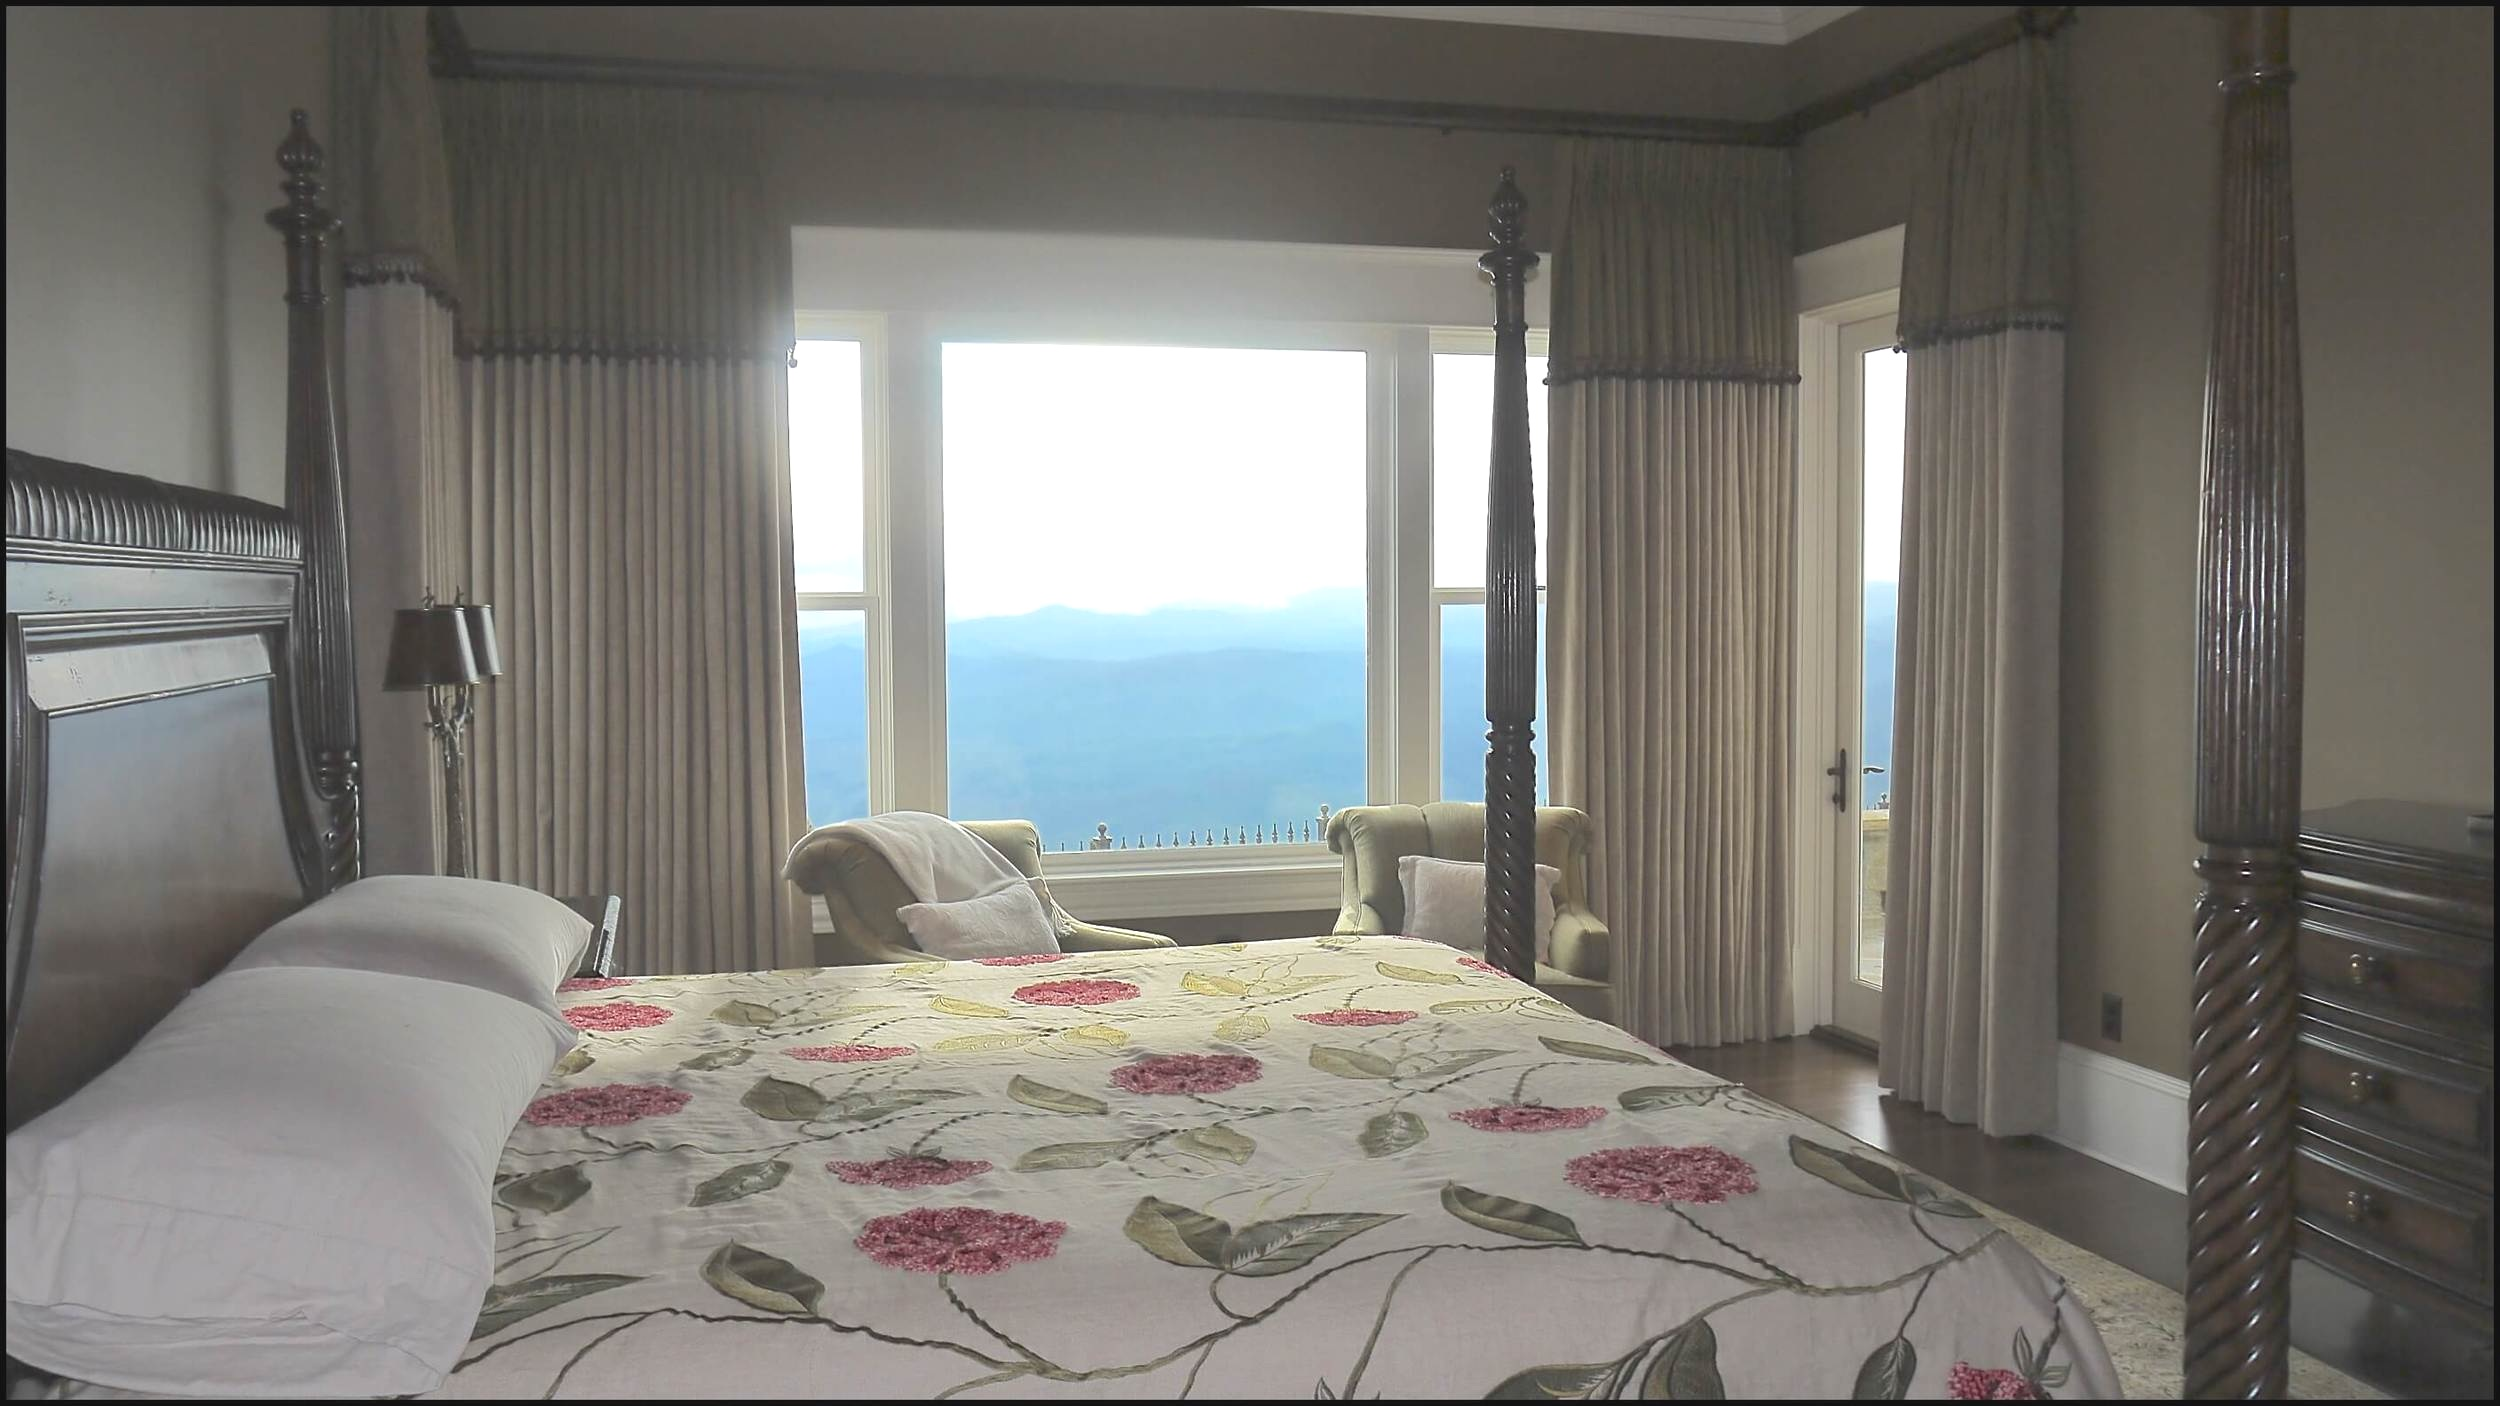 Master bedroom in Blowing Rock, NC